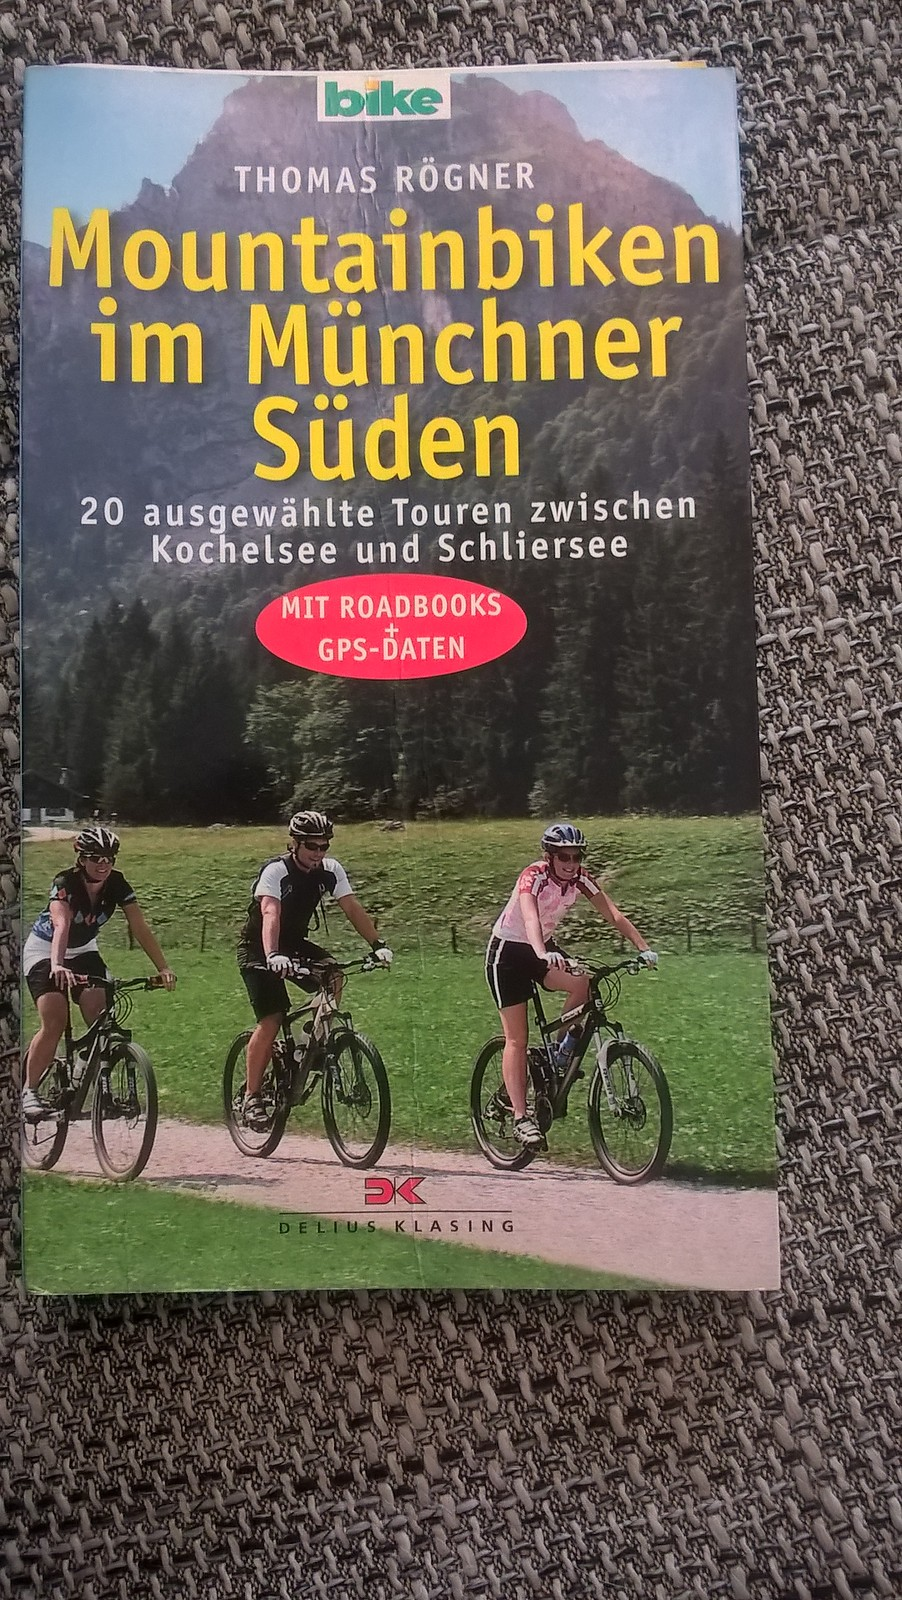 delius klasing verlag mountainbiken im m nchner s den bikemarkt mtb. Black Bedroom Furniture Sets. Home Design Ideas